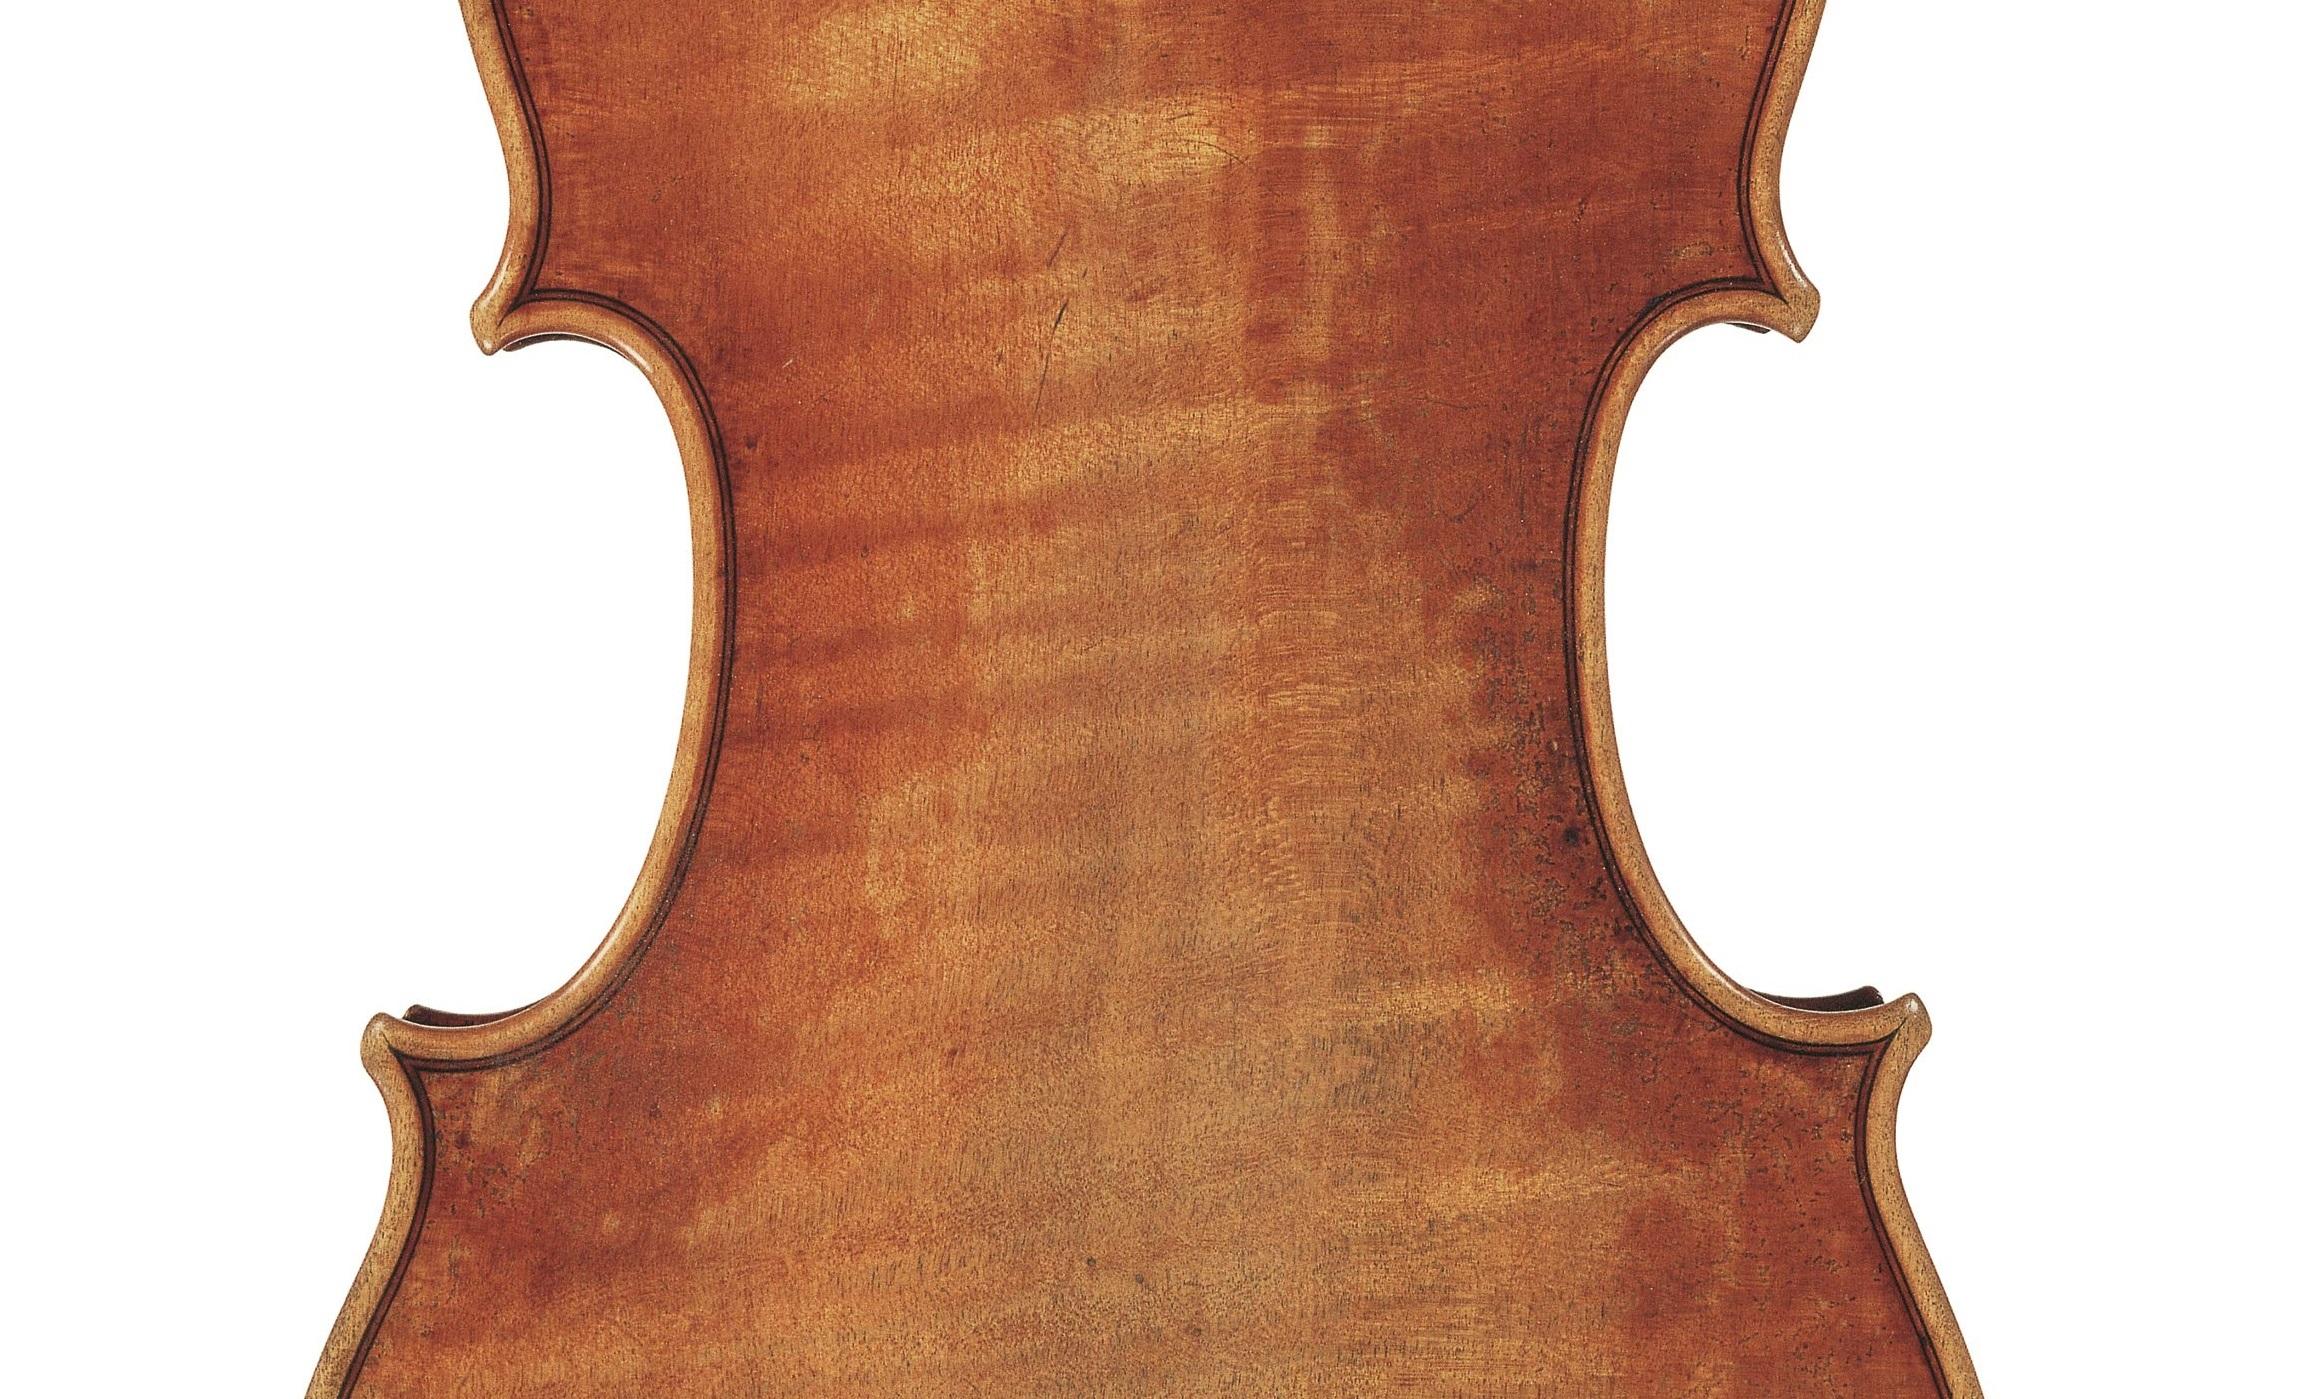 Back of the Dancla violin by Antonio Stradivari, Cremona, 1703